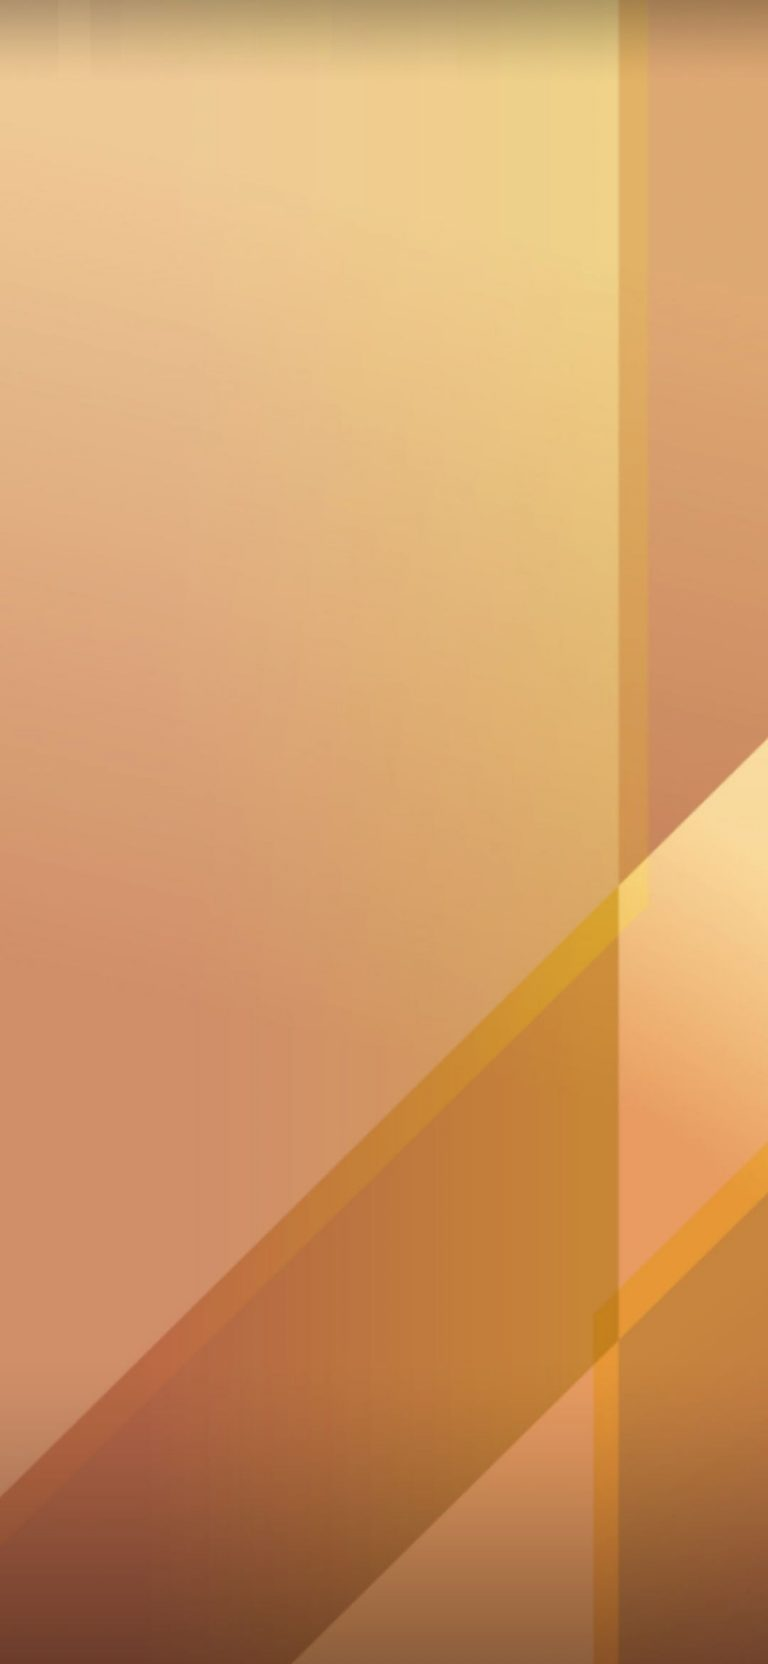 Honor X10 Stock Wallpaper [1080x2340] - 03